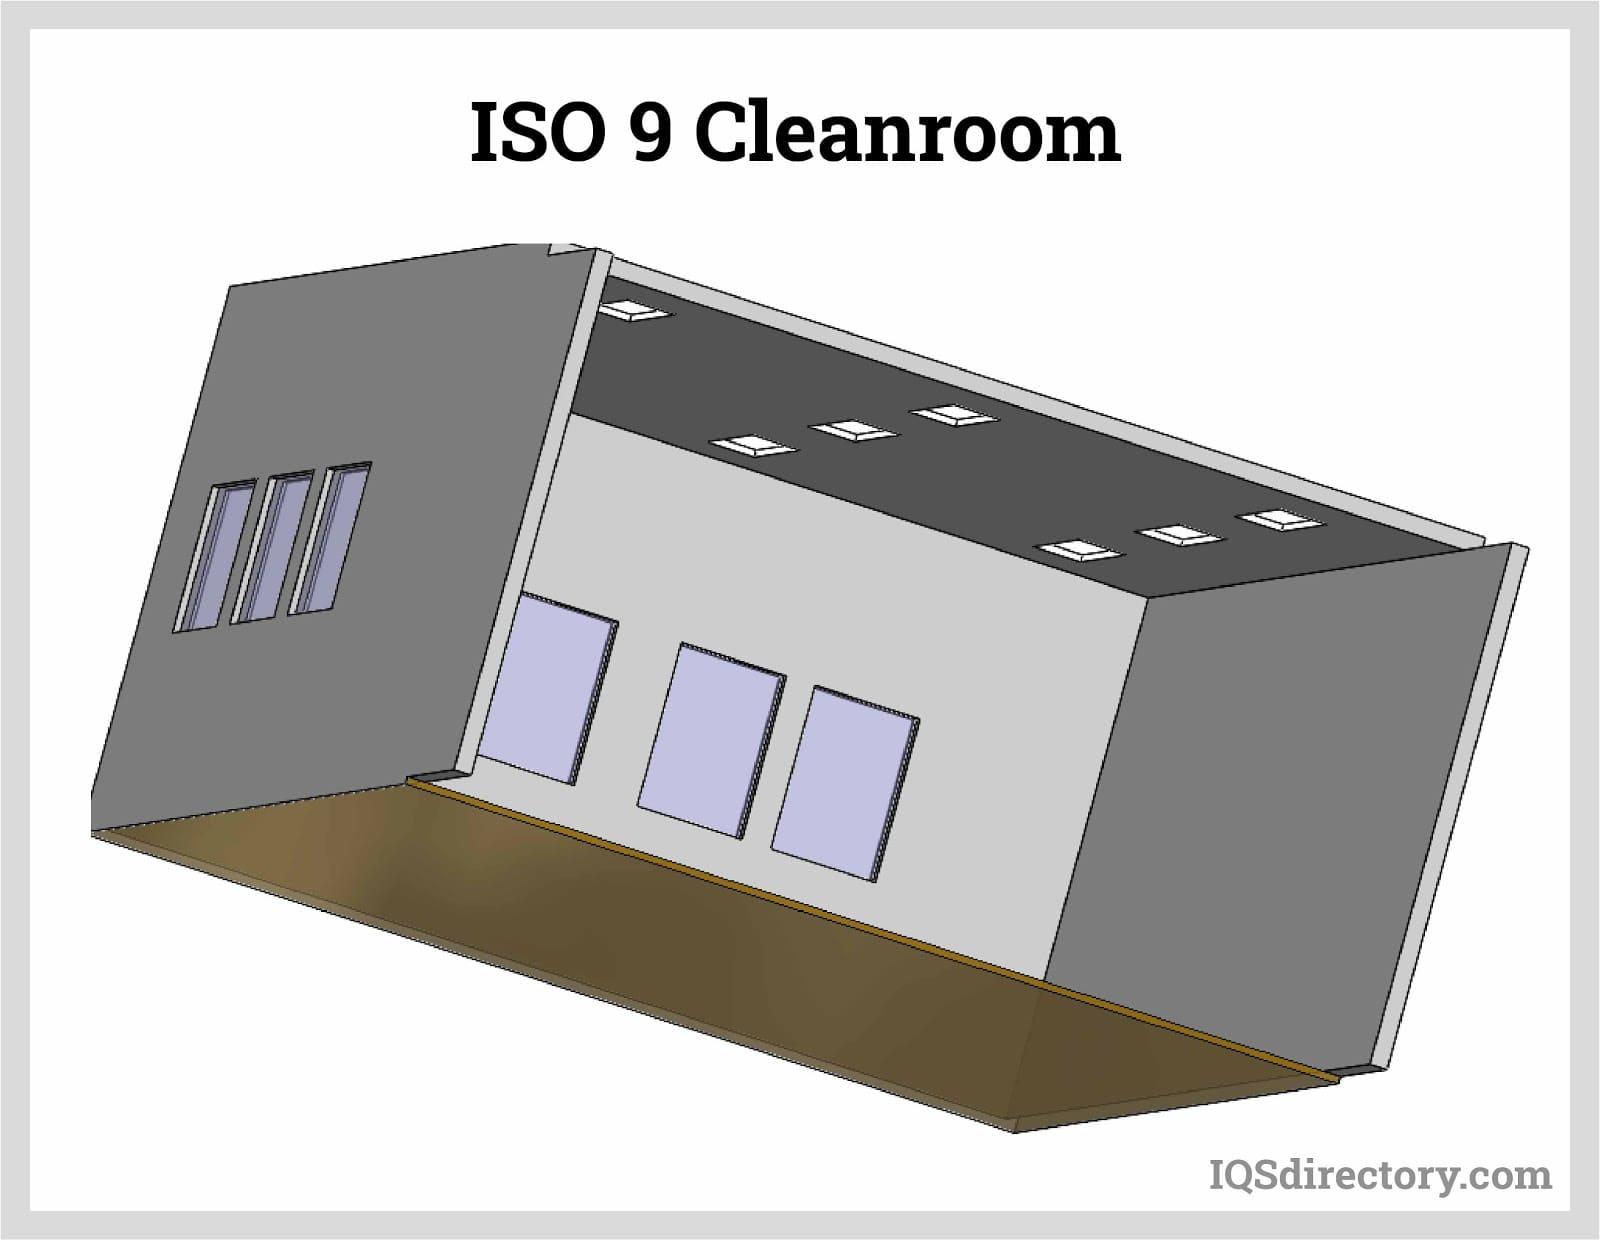 ISO 9 Cleanroom